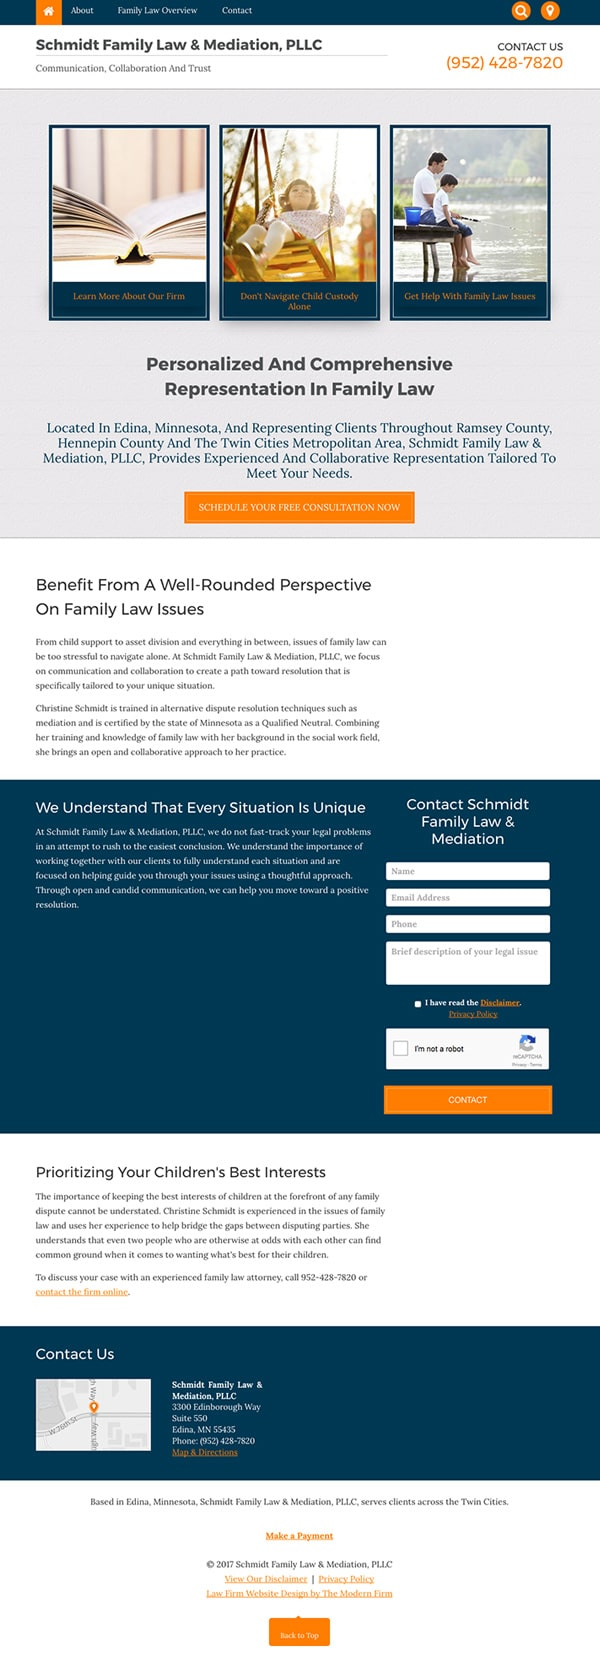 Law Firm Website Design for Schmidt Family Law & Mediation, PLLC